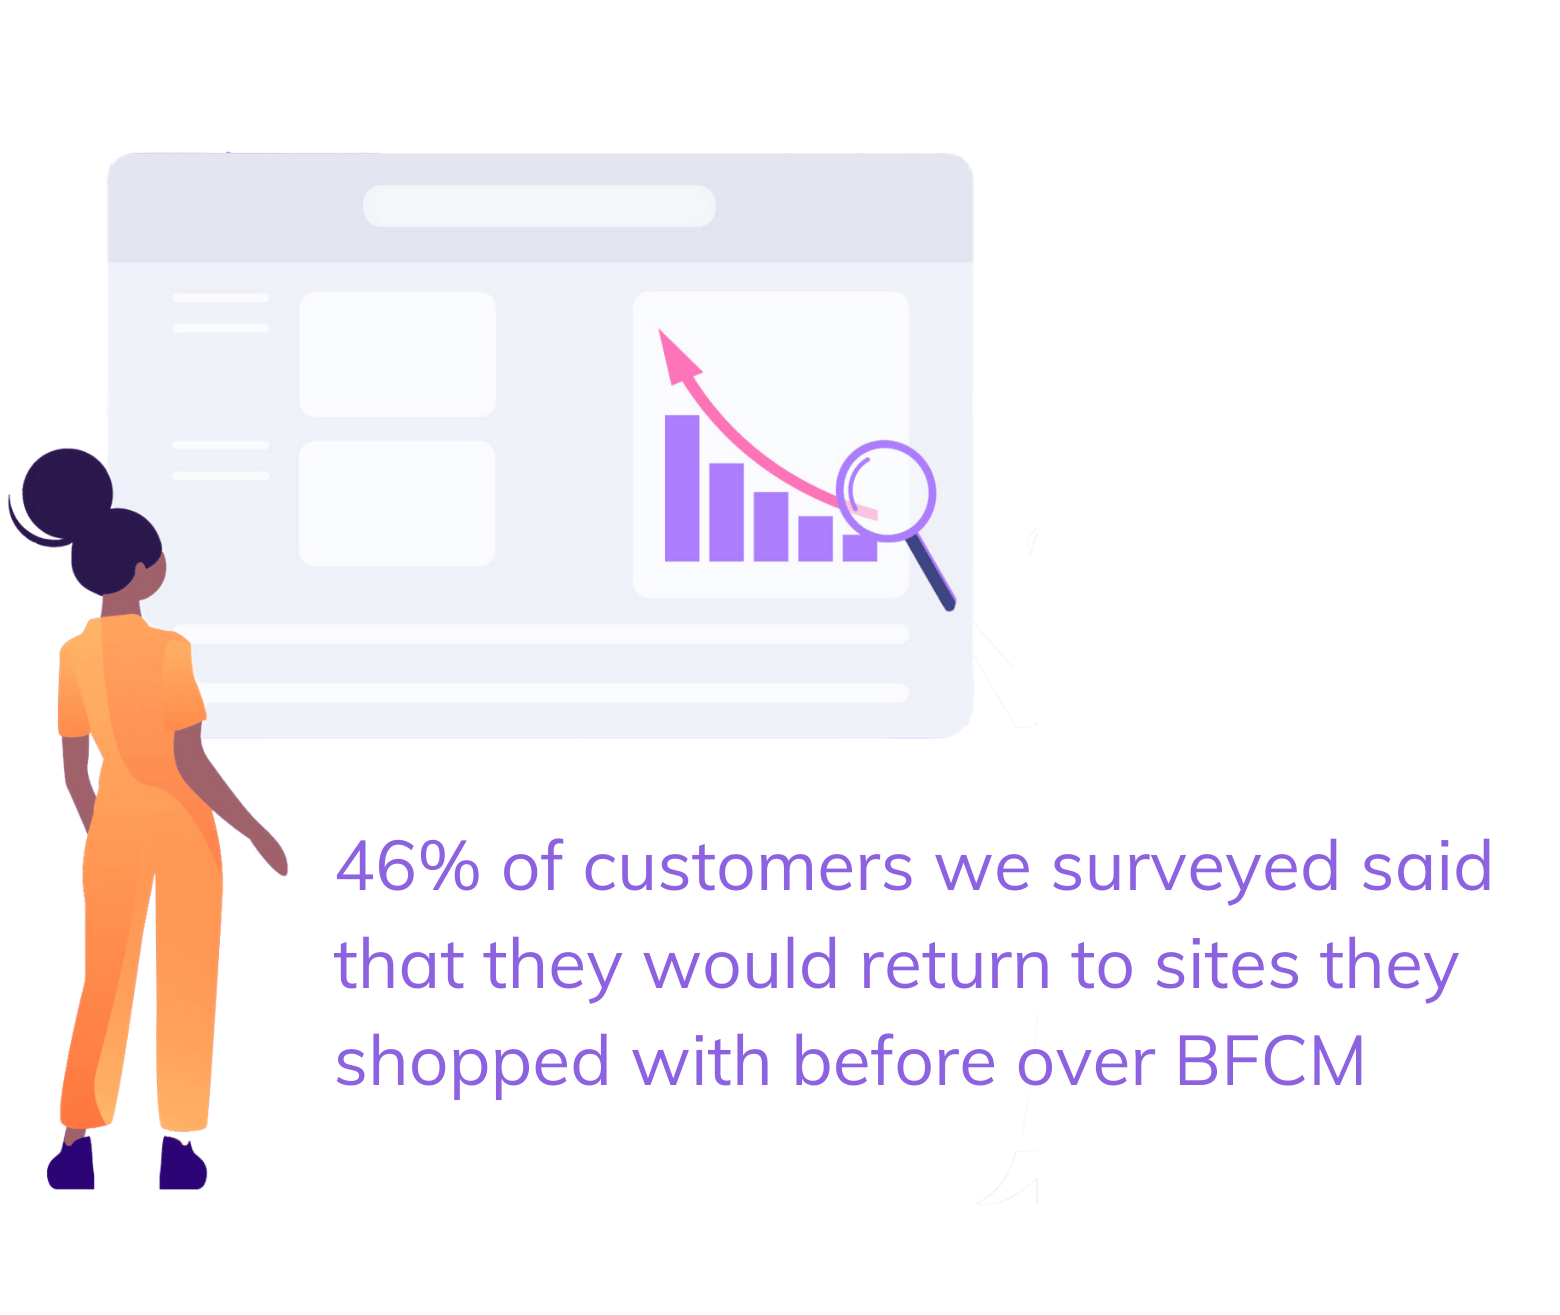 Bfcm Statistics